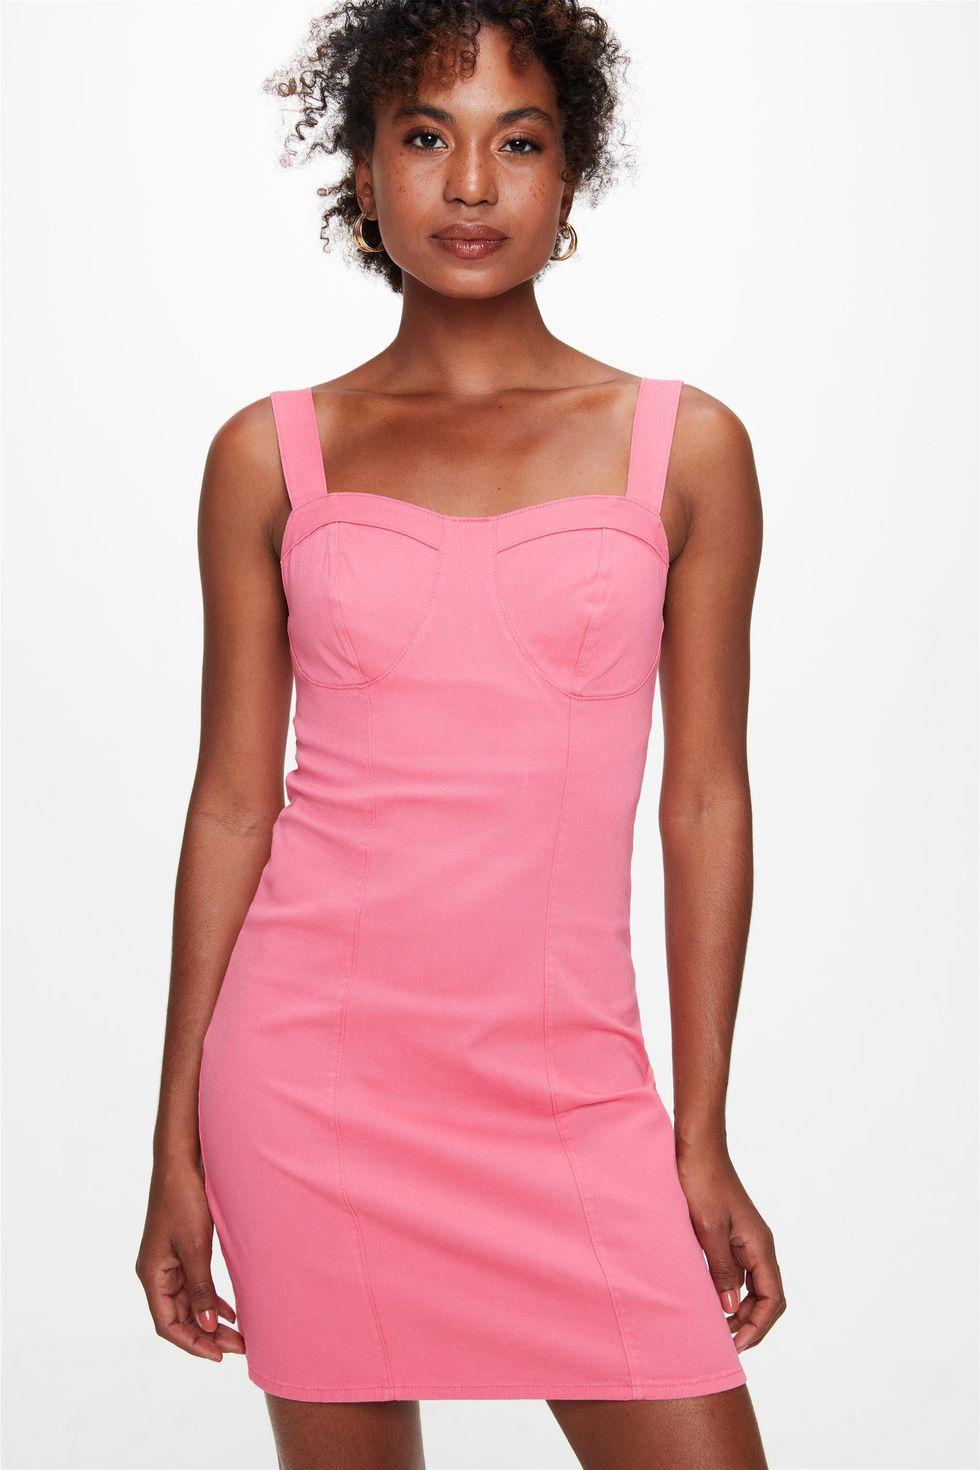 Vestido-Curto-de-Alca-com-Recortes-Rosa-Frente--